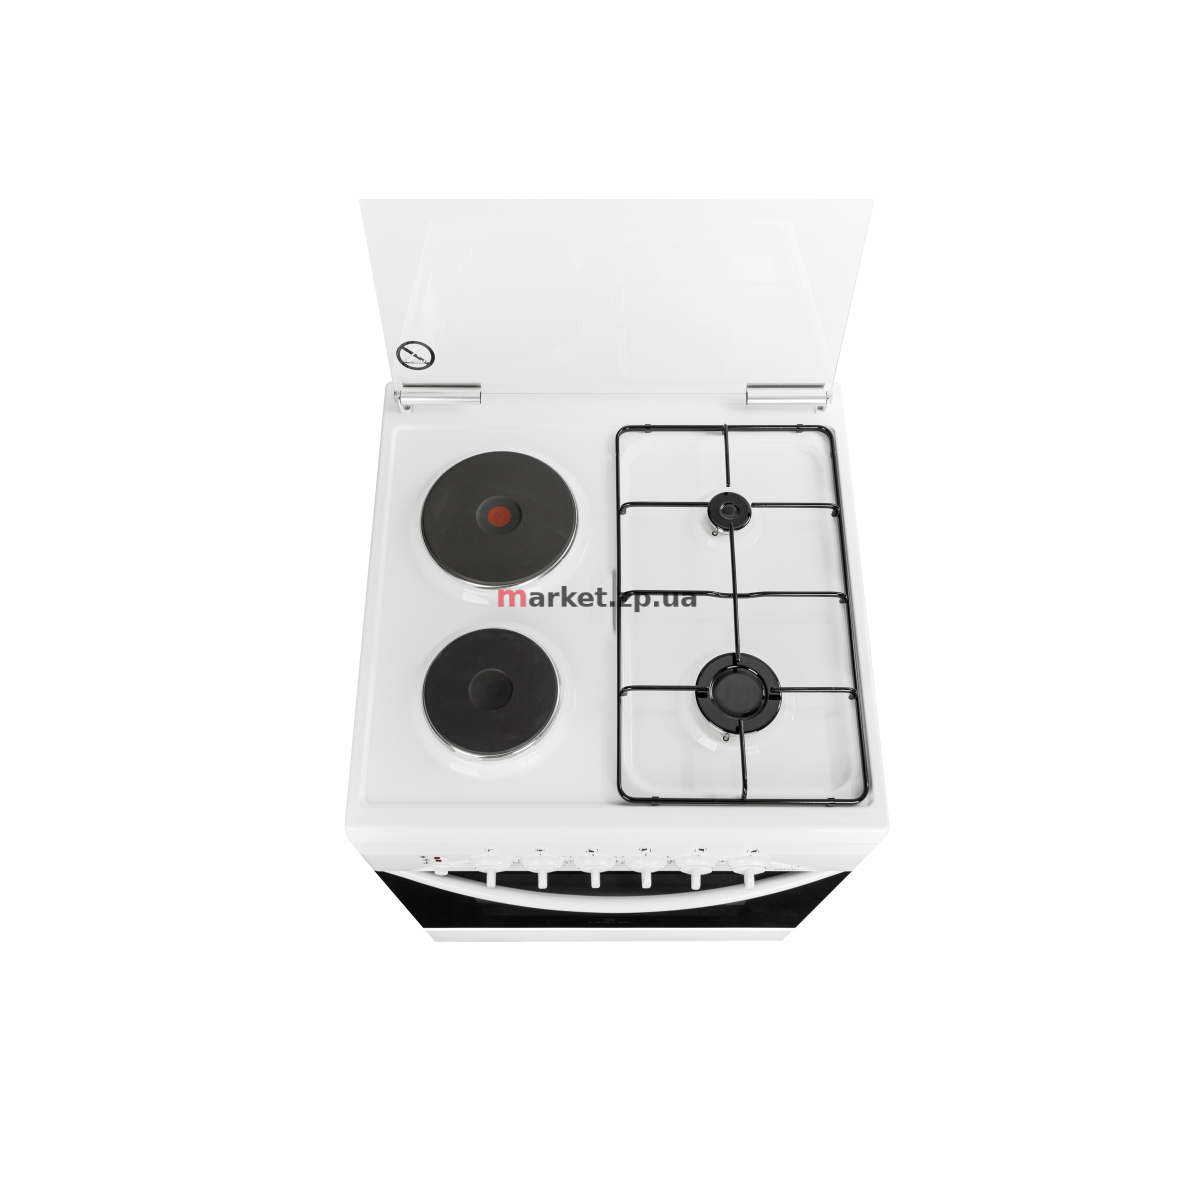 Плита GRETA м.600-ГЭ-27 м.р.  (2+2) а